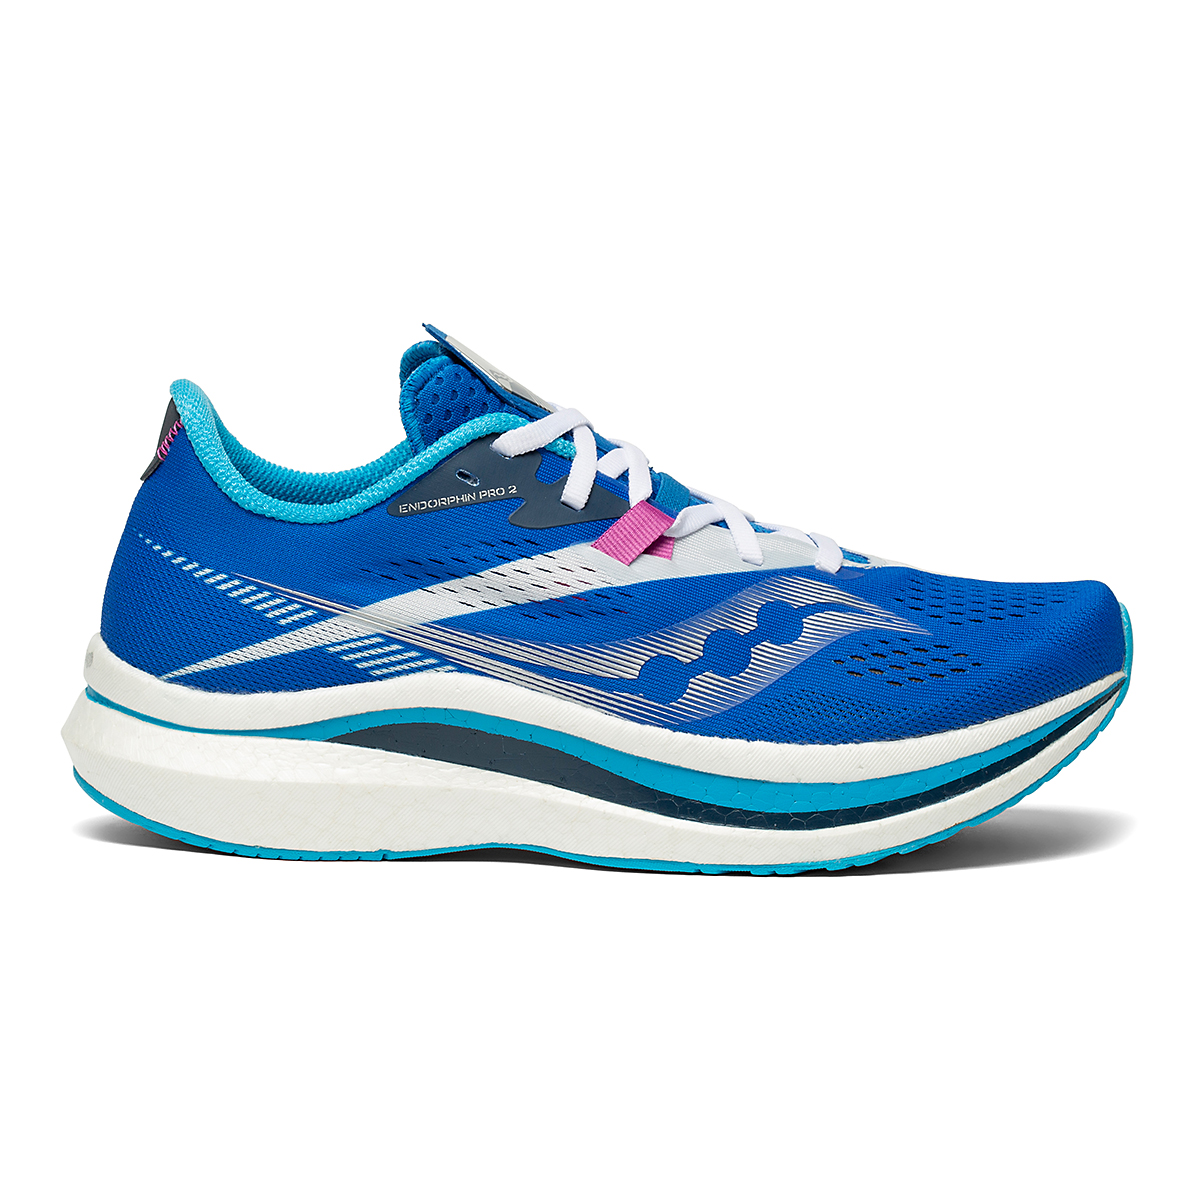 Women's Saucony Endorphin Pro 2 Running Shoe - Color: Royal/White - Size: 5 - Width: Regular, Royal/White, large, image 1